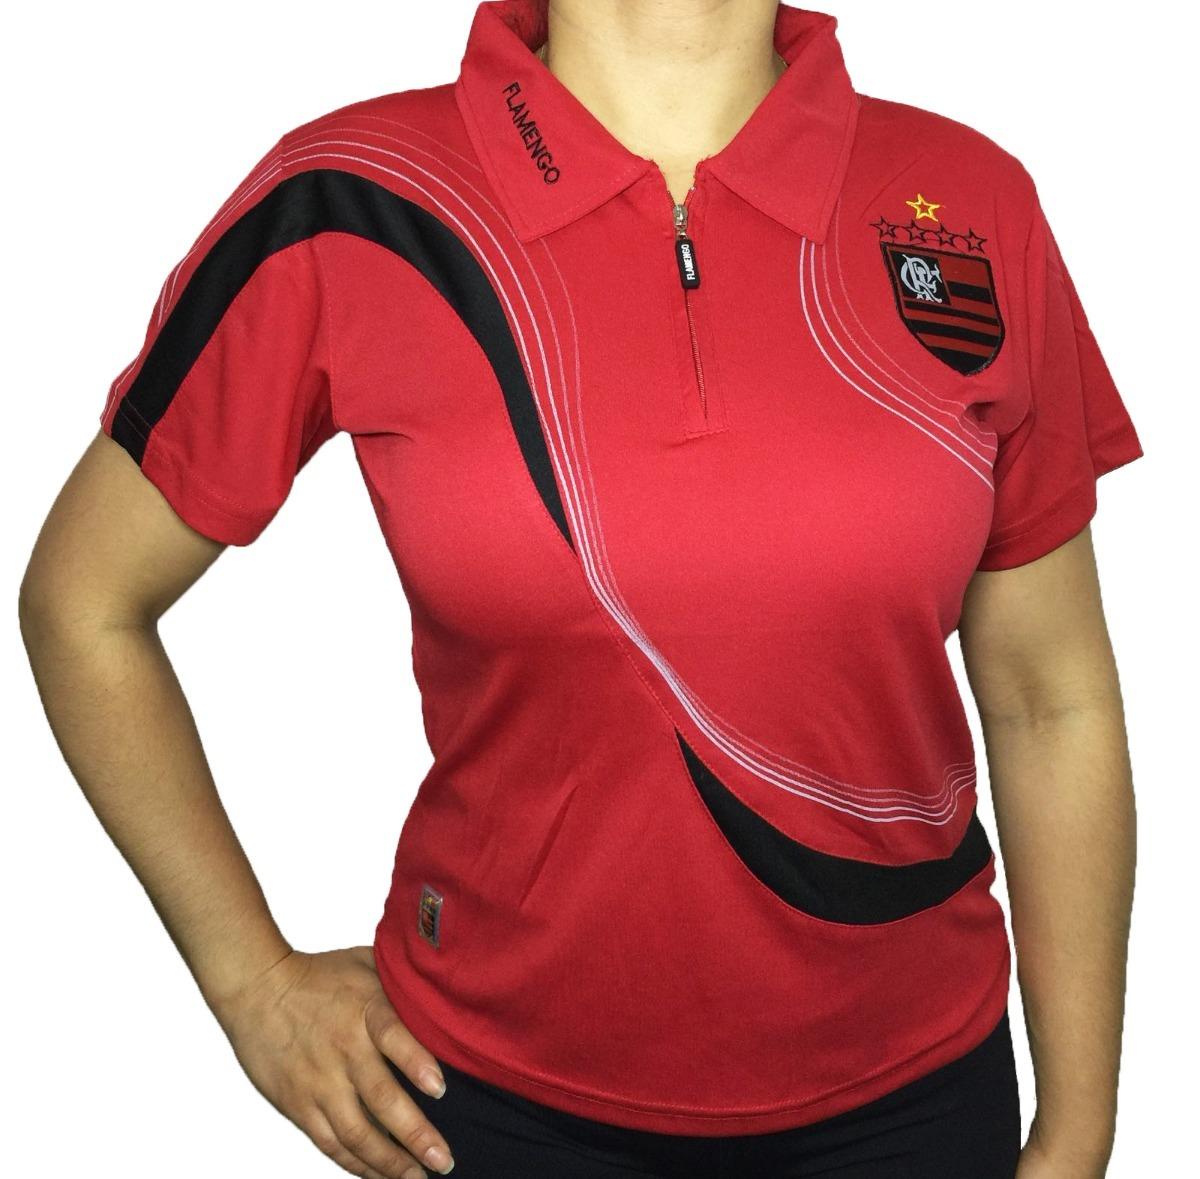 Camisa Polo Do Flamengo Baby Look Feminina Oficial - R  49 dad8ba048eb27